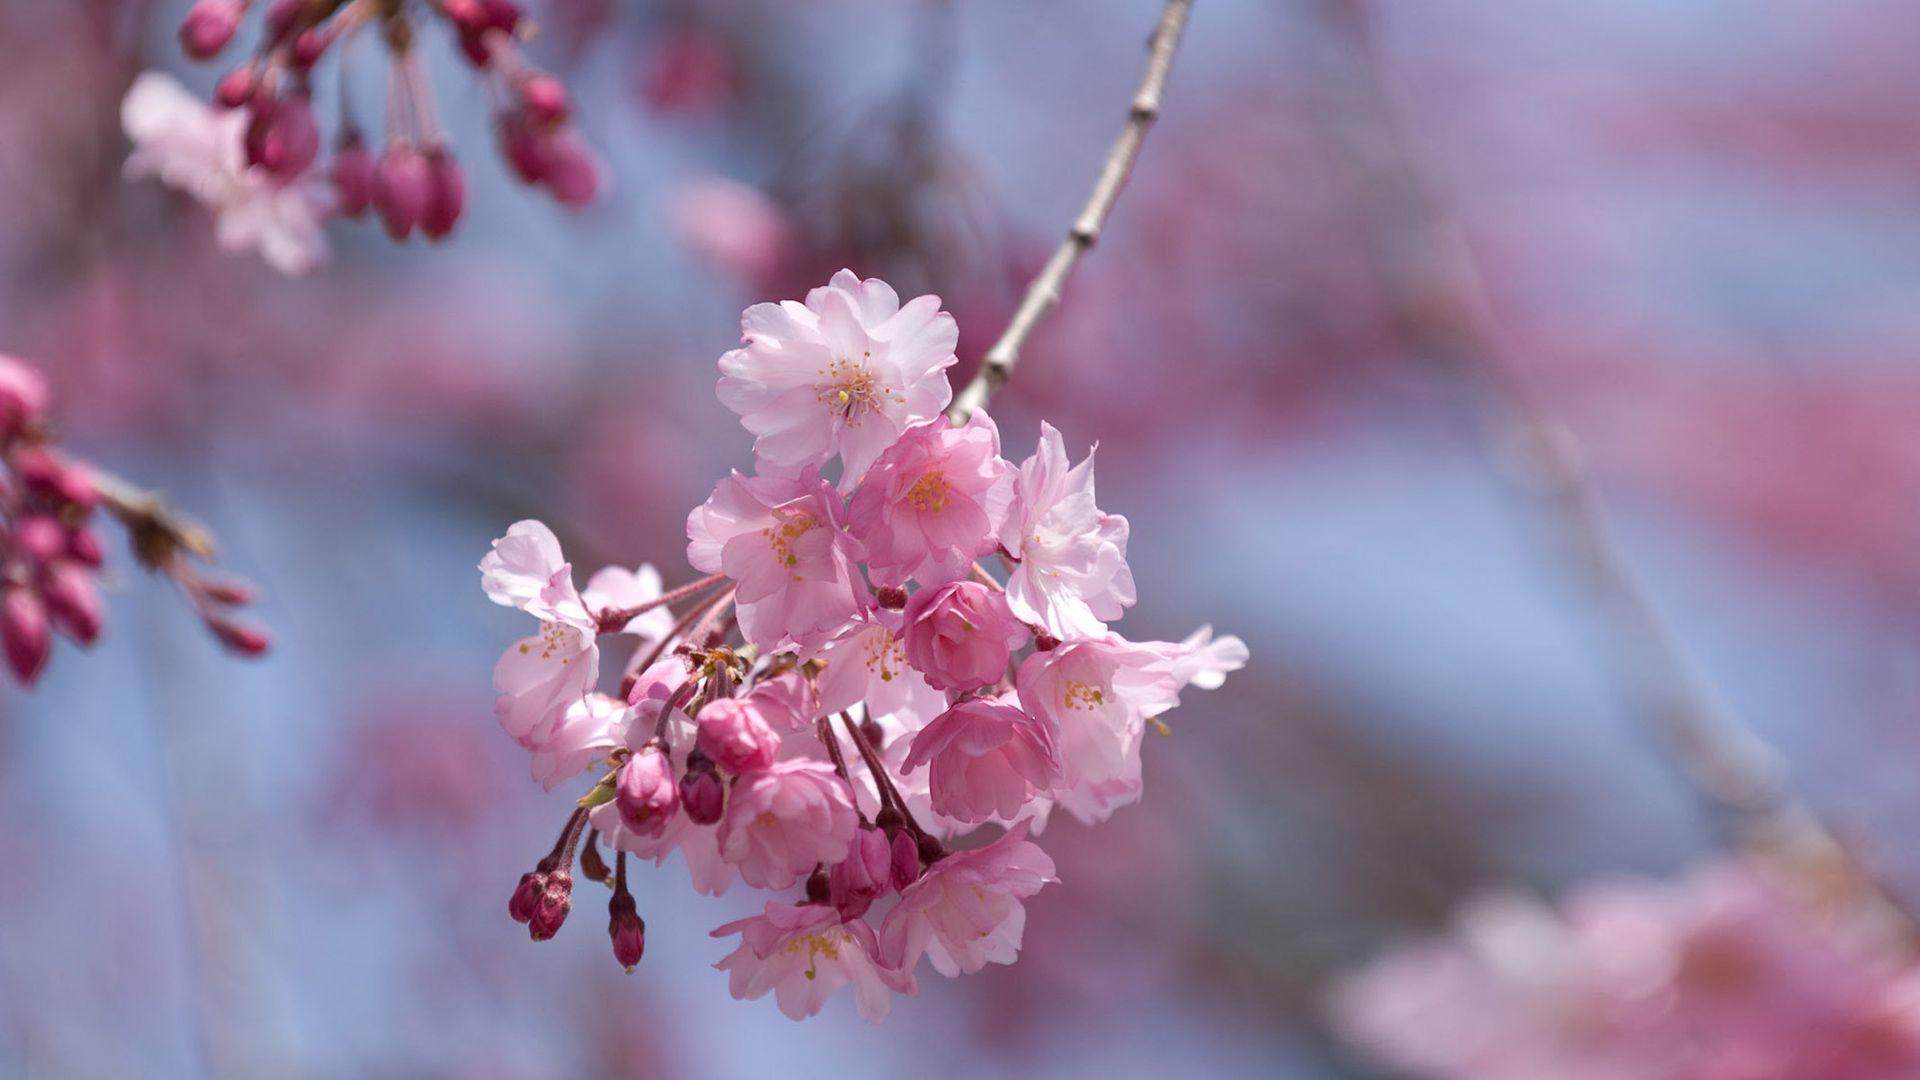 Cute Spring 1080p wallpaper